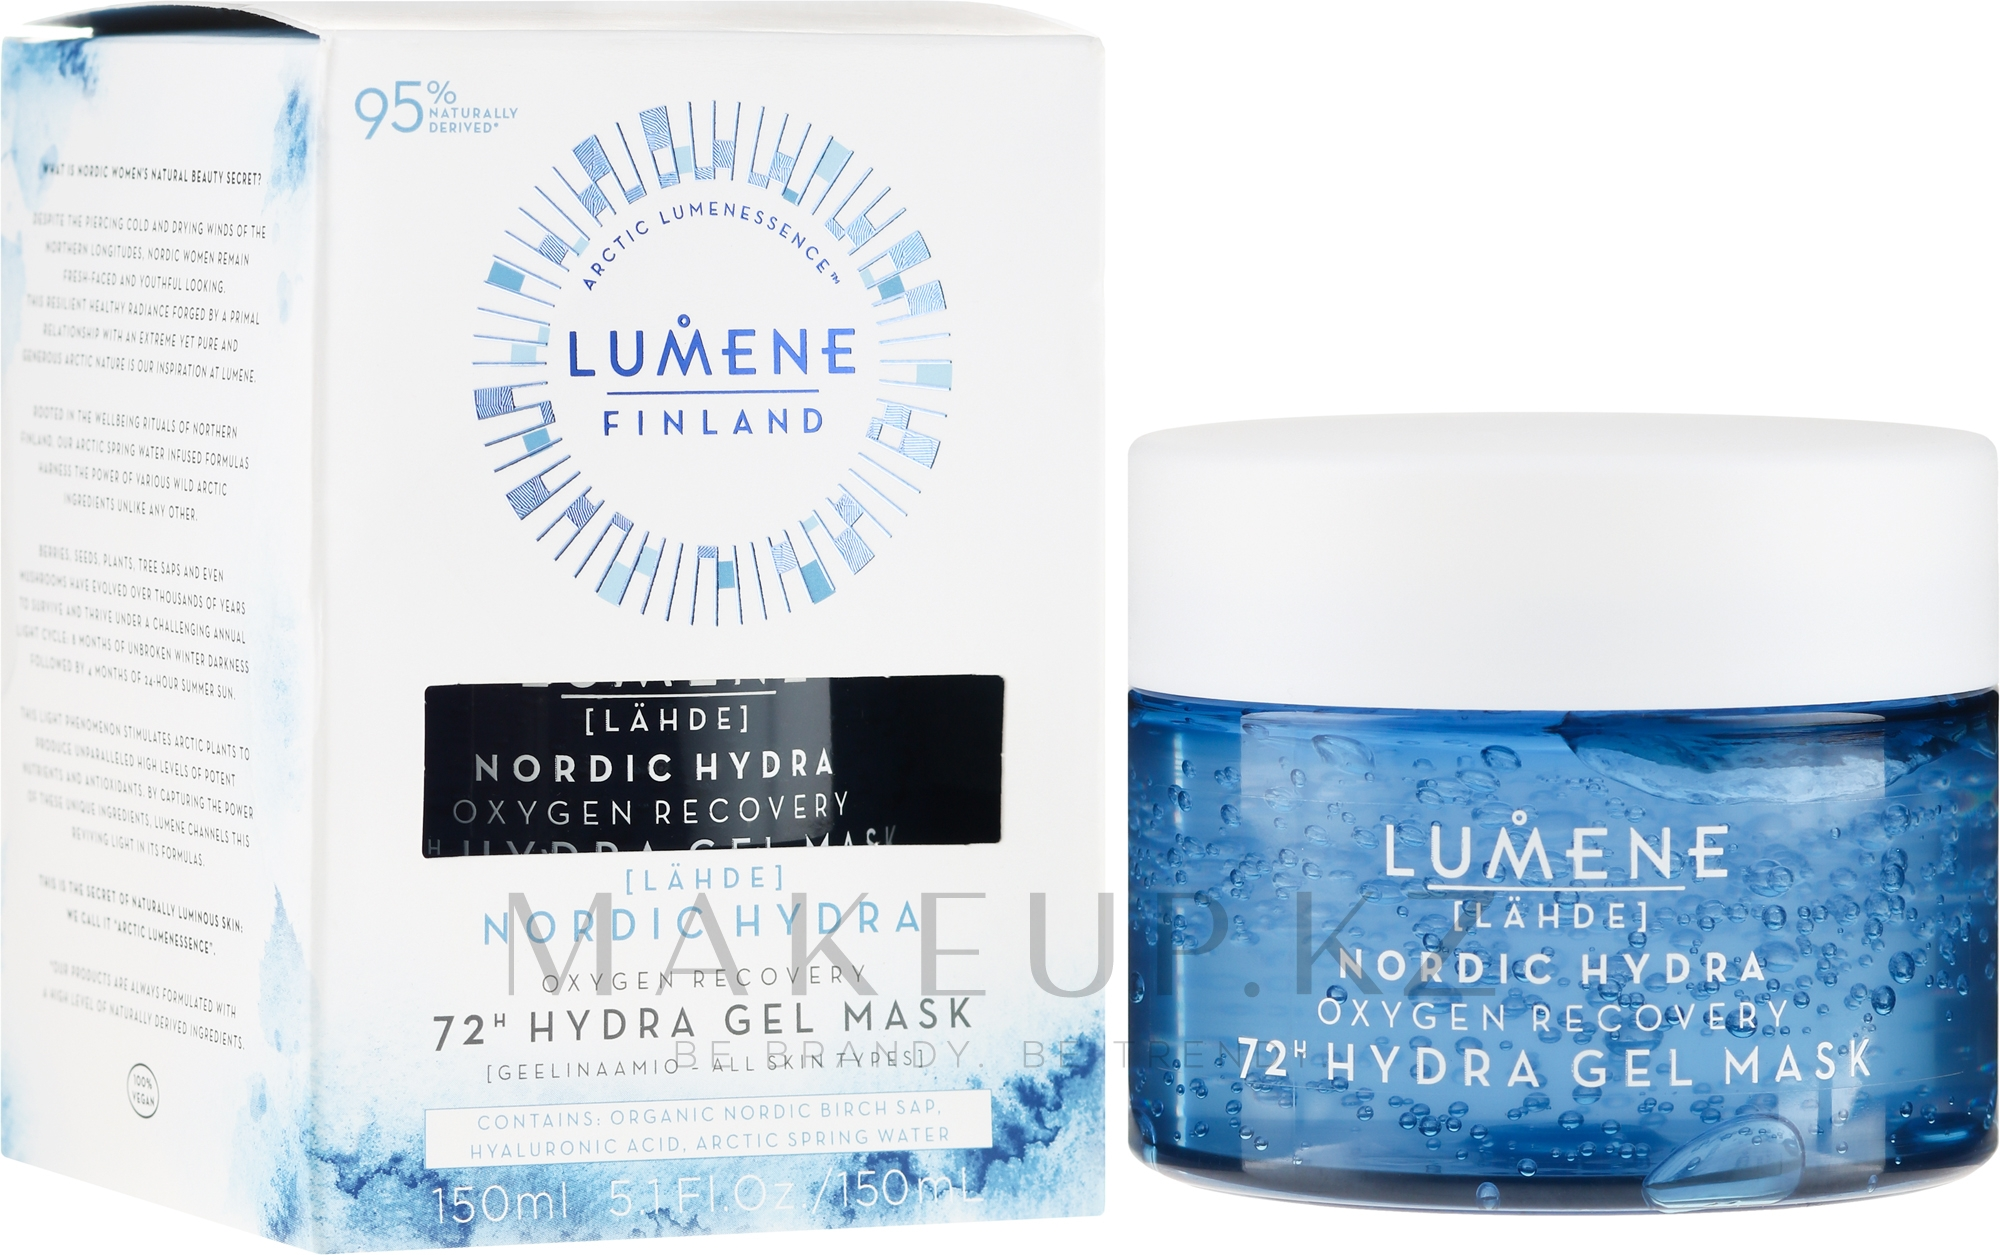 Увлажняющая и восстанавливающая кислородная маска для лица - Lumene Nordic Hydra 72H Gel Mask — фото 150 ml